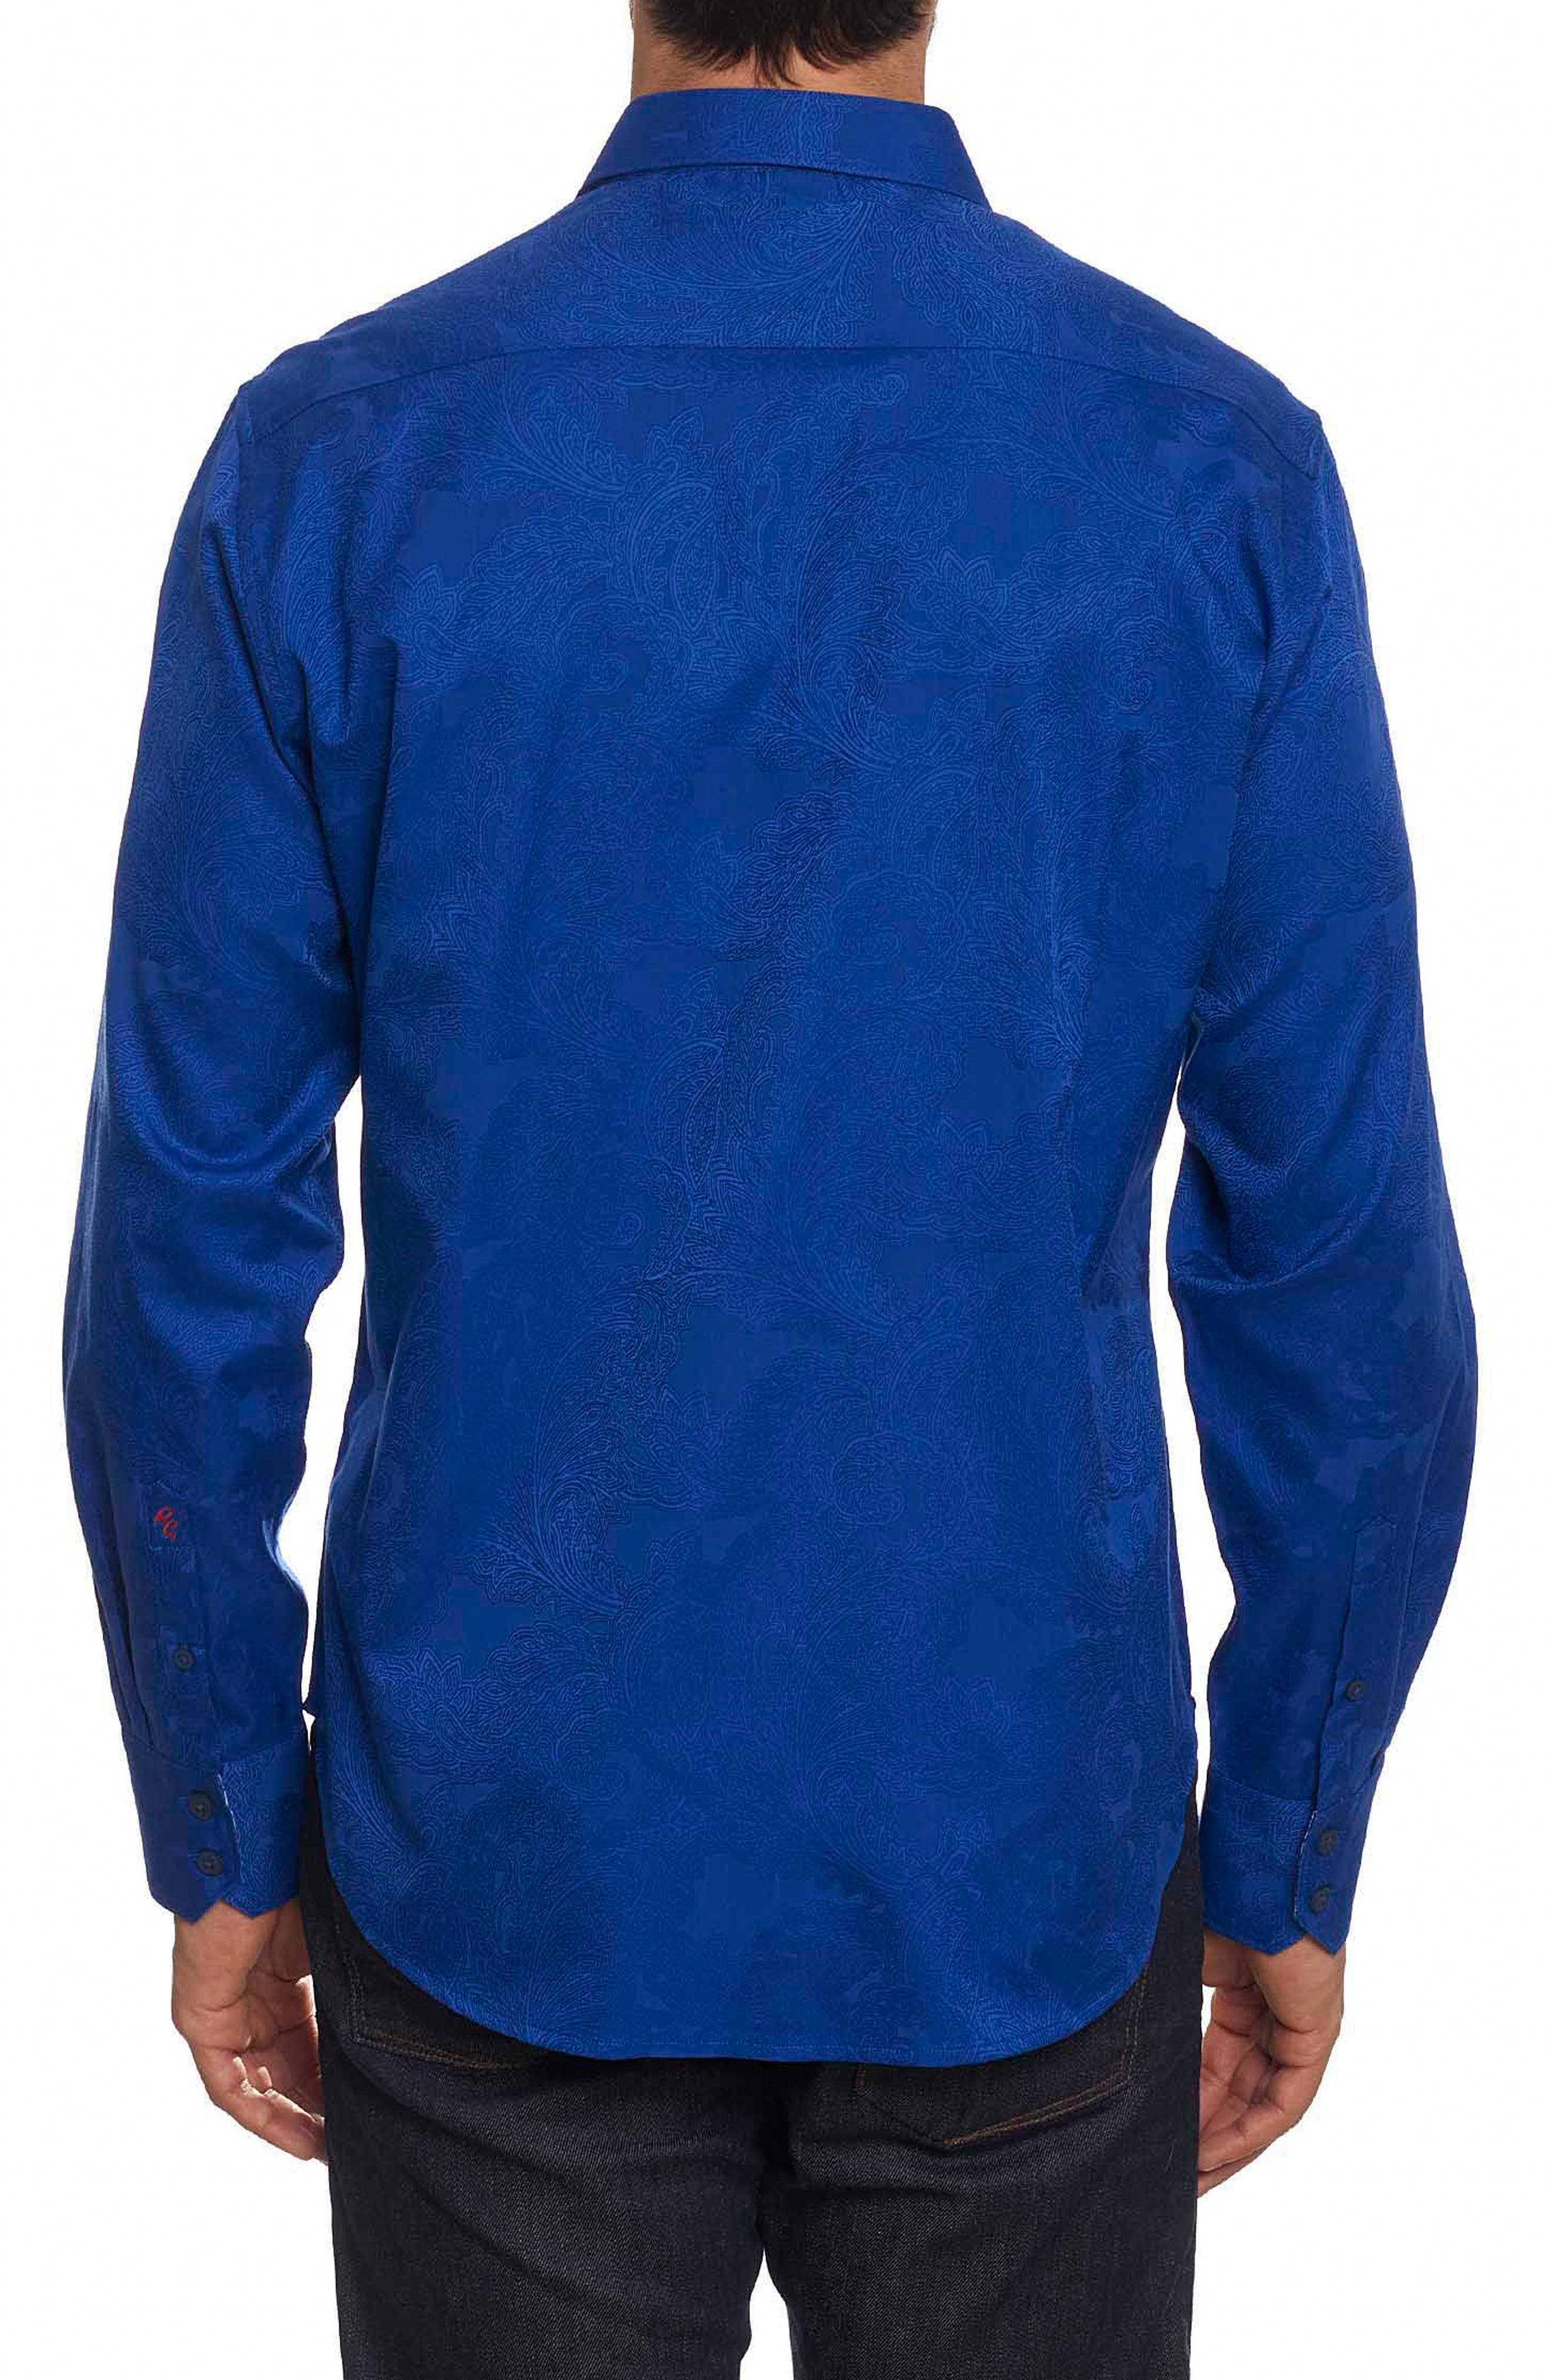 Alternate Image 2  - Robert Graham Rosendale Classic Fit Jacquard Sport Shirt